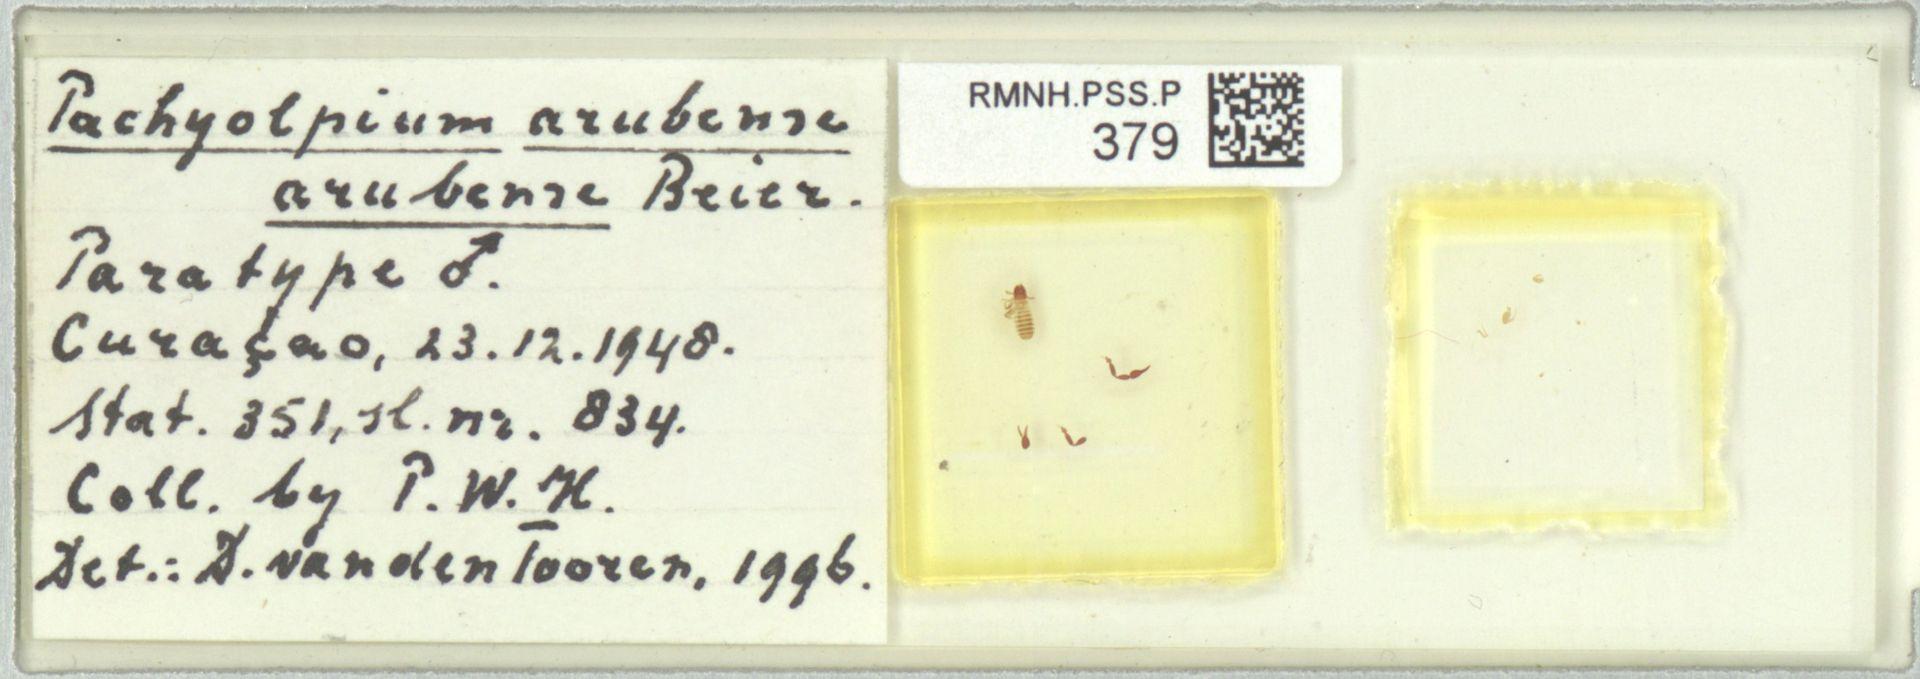 RMNH.PSS.P.379 | Pachyolpium arubense arubense